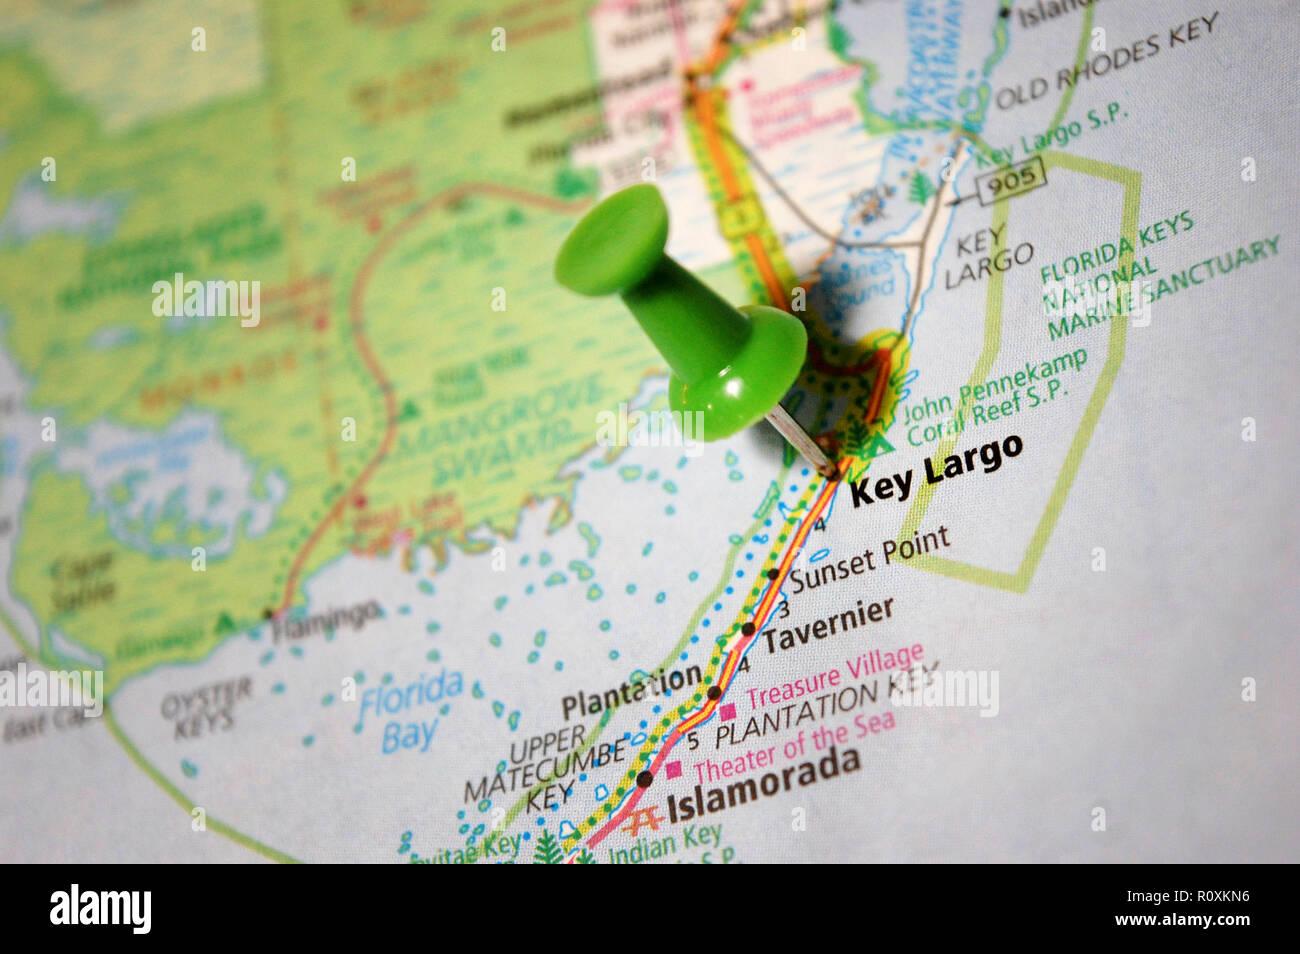 Key Largo Florida Map.A Map Of Key Largo Florida Marked With A Push Pin Stock Photo